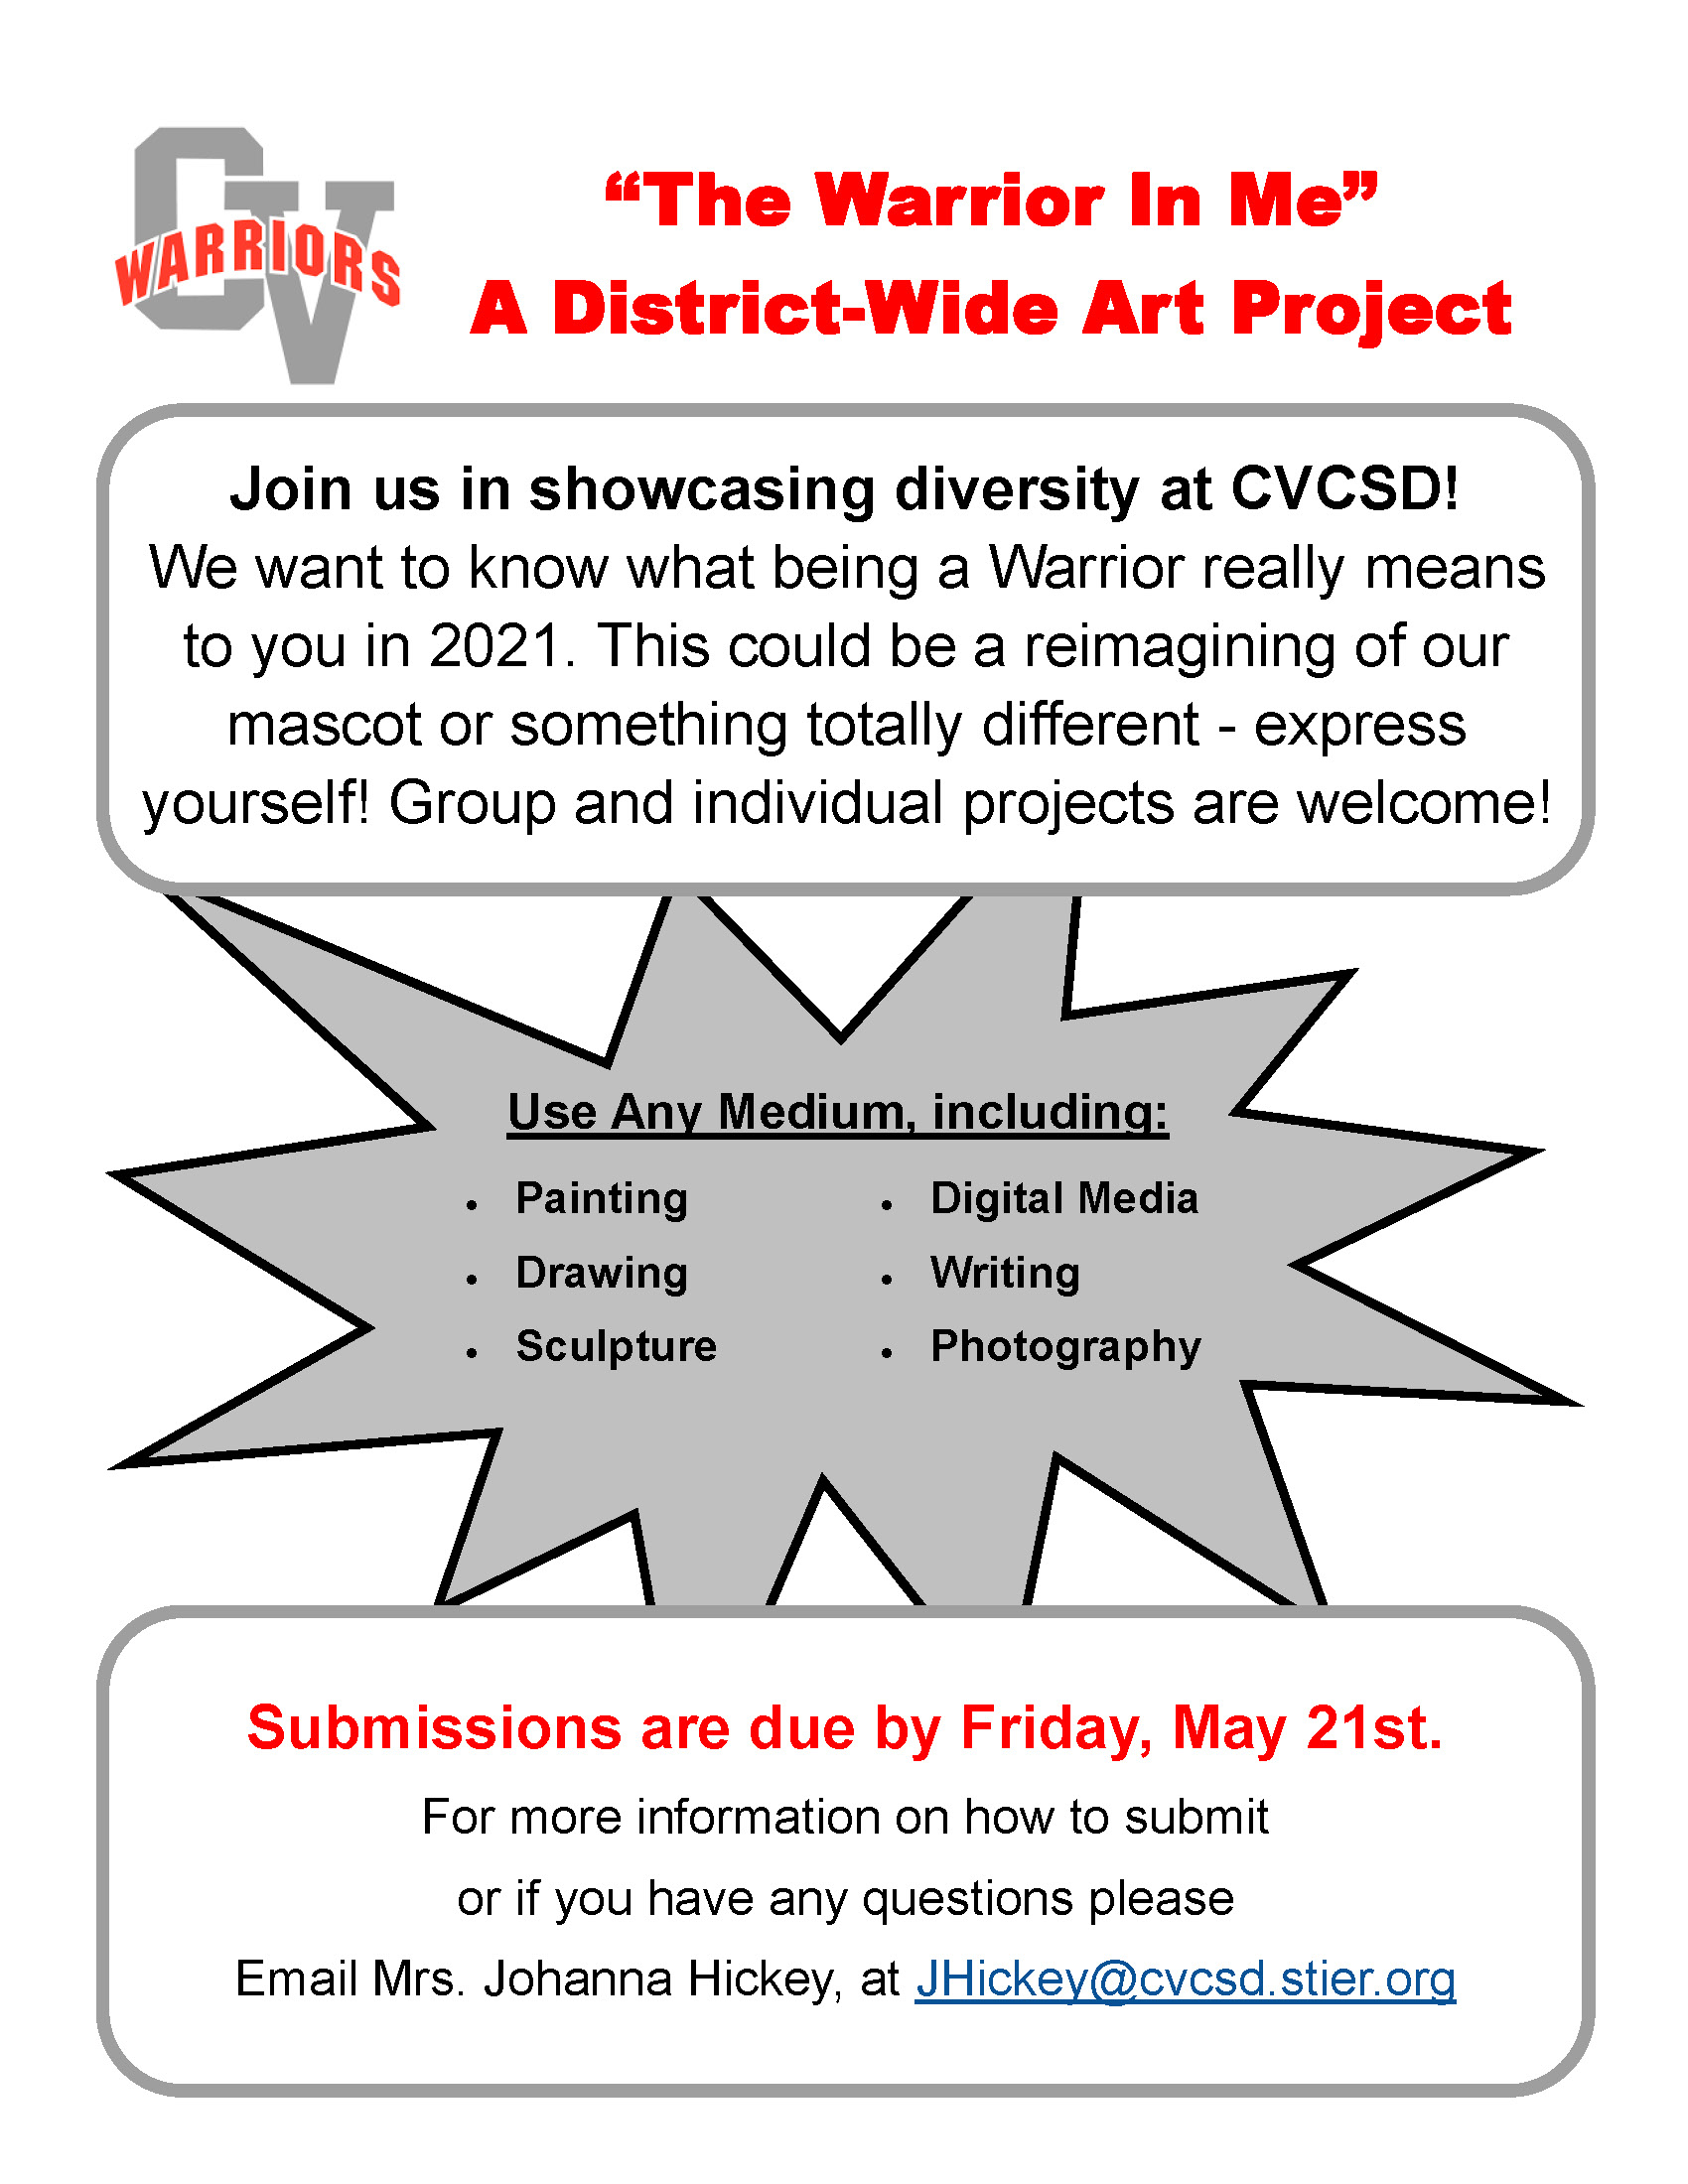 Warrior in Me Art Project Description